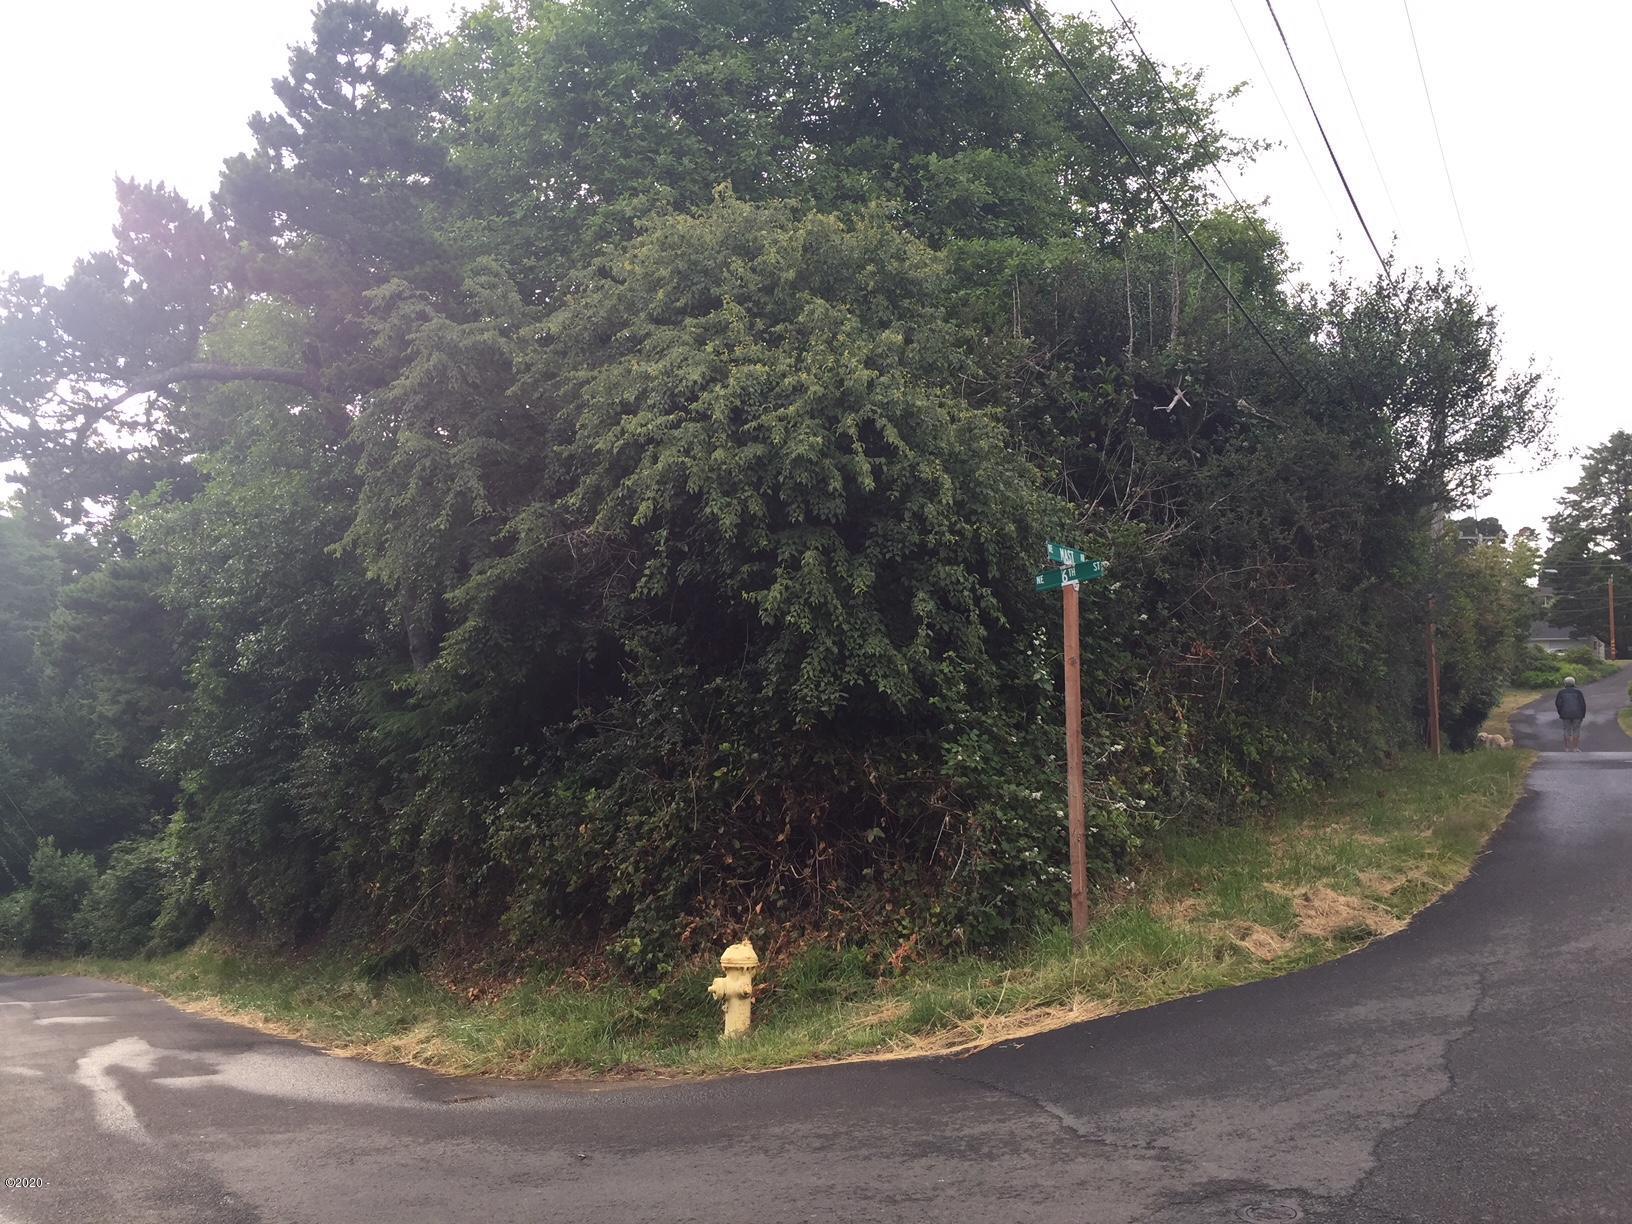 699 NE Mast Ave, Lincoln City, OR 97367 - Corner lot